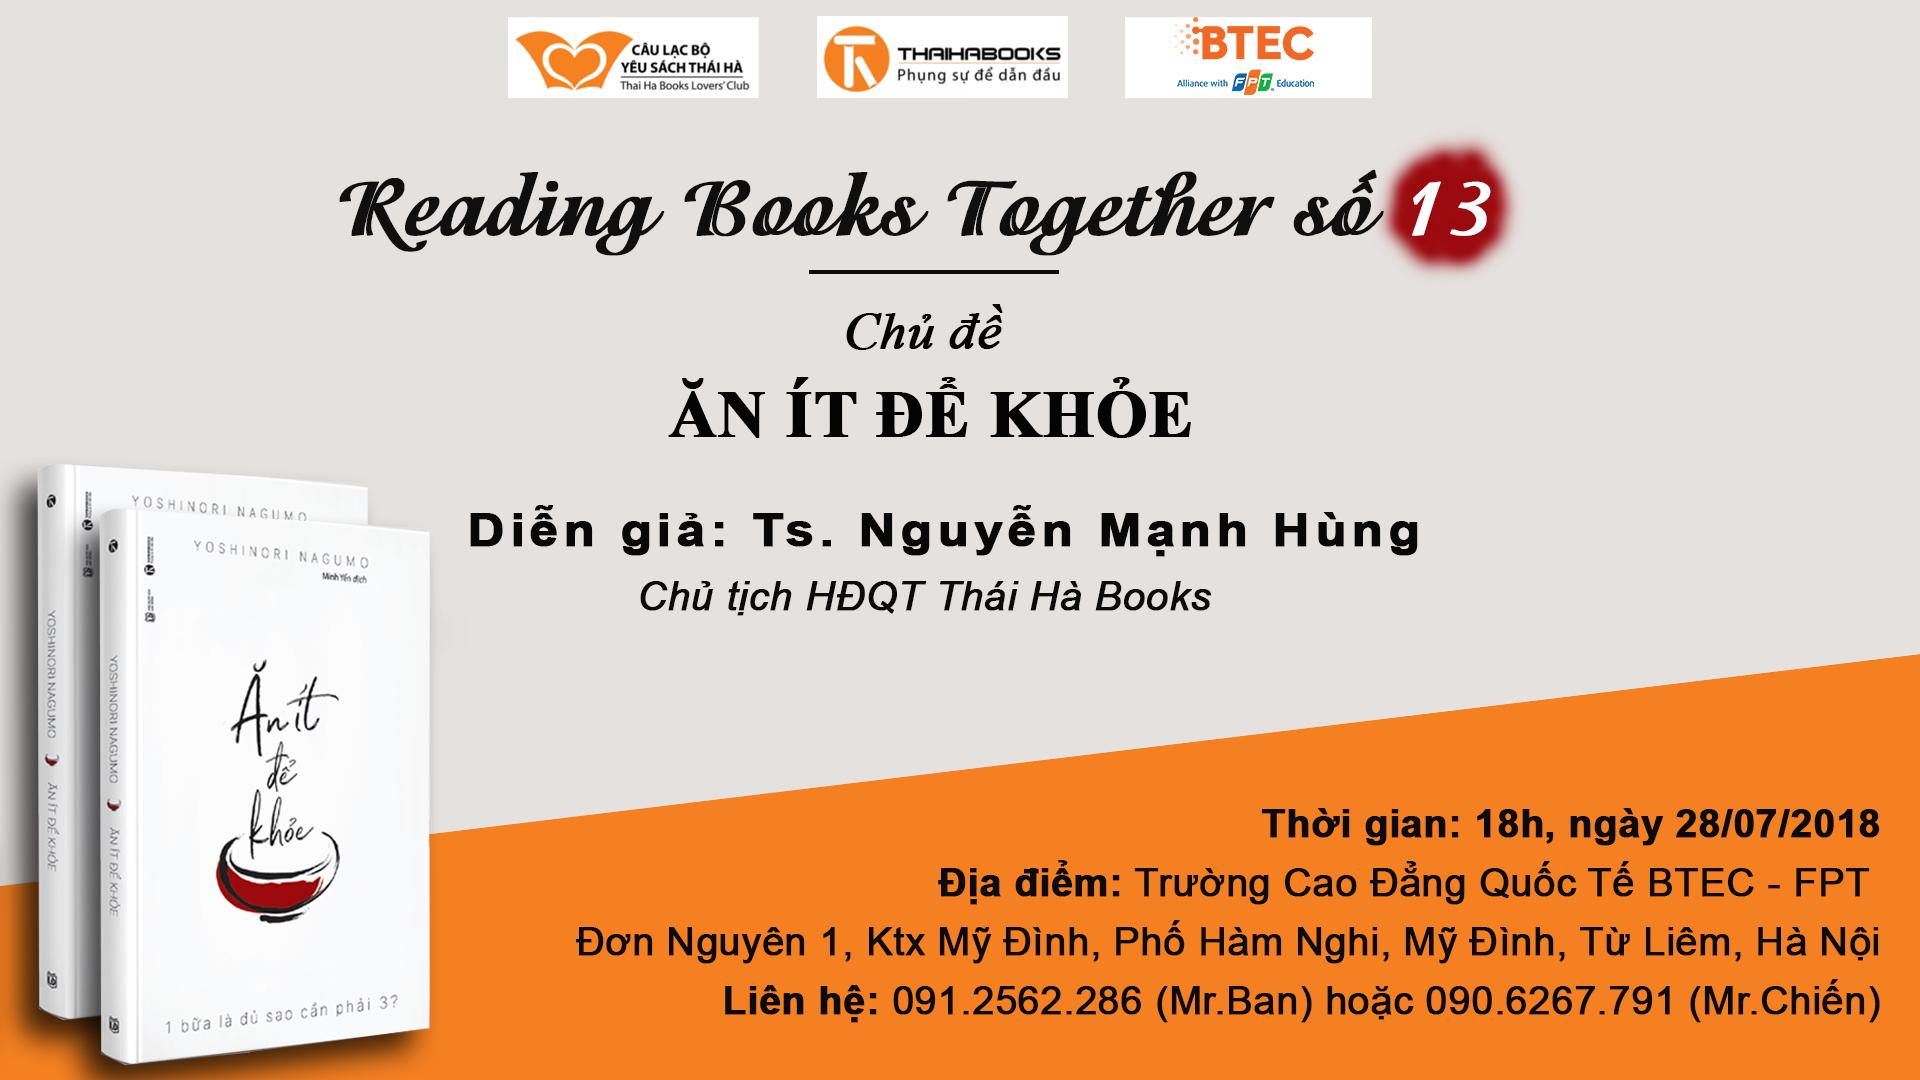 Reading Books Together số 13: Ăn ít để khỏe